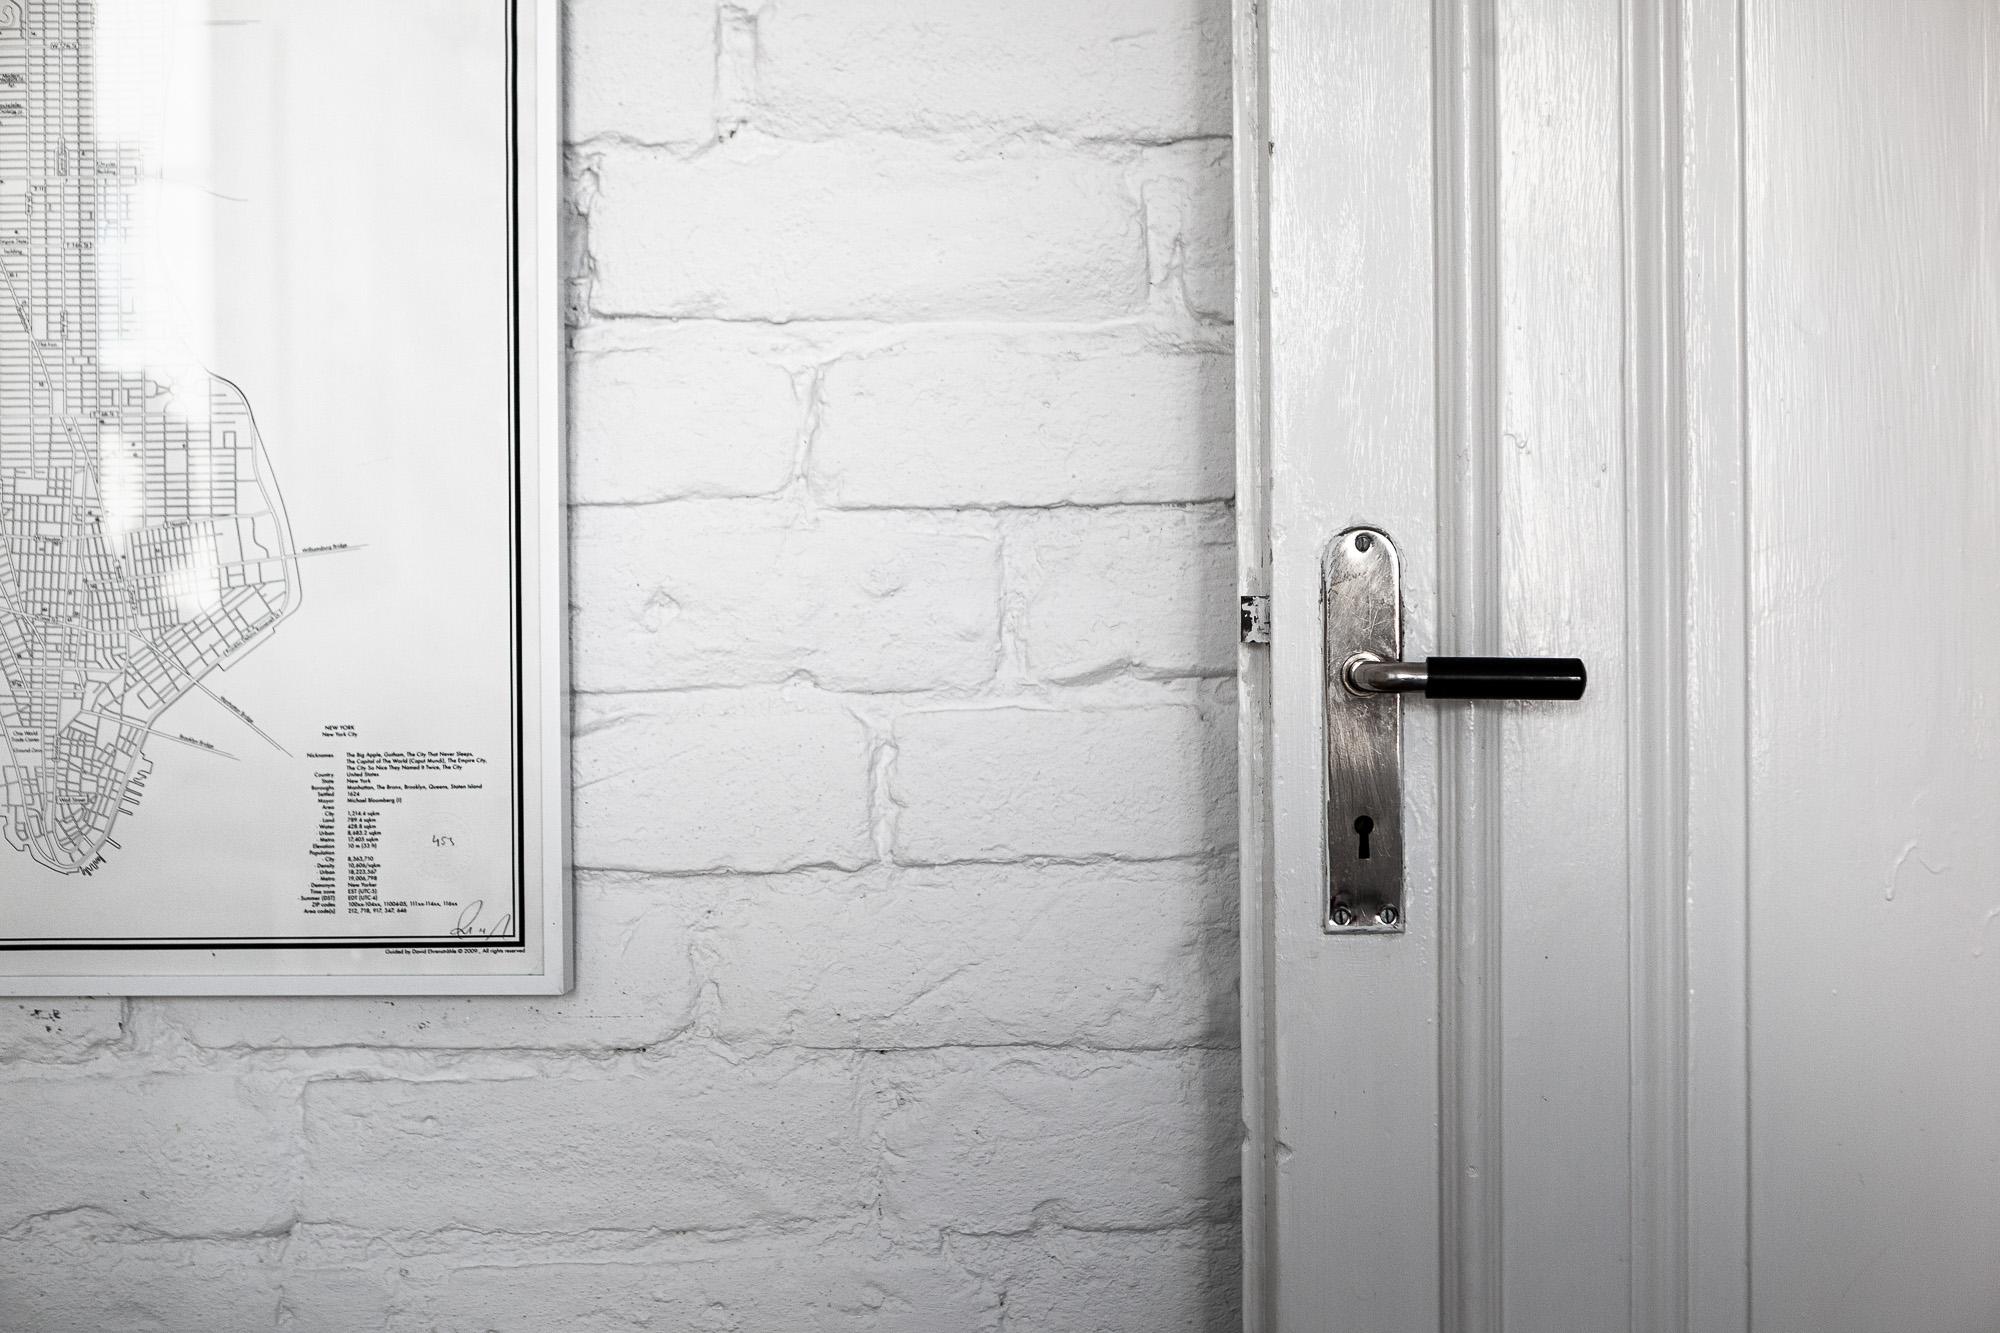 белая стена кирпич дверная ручка